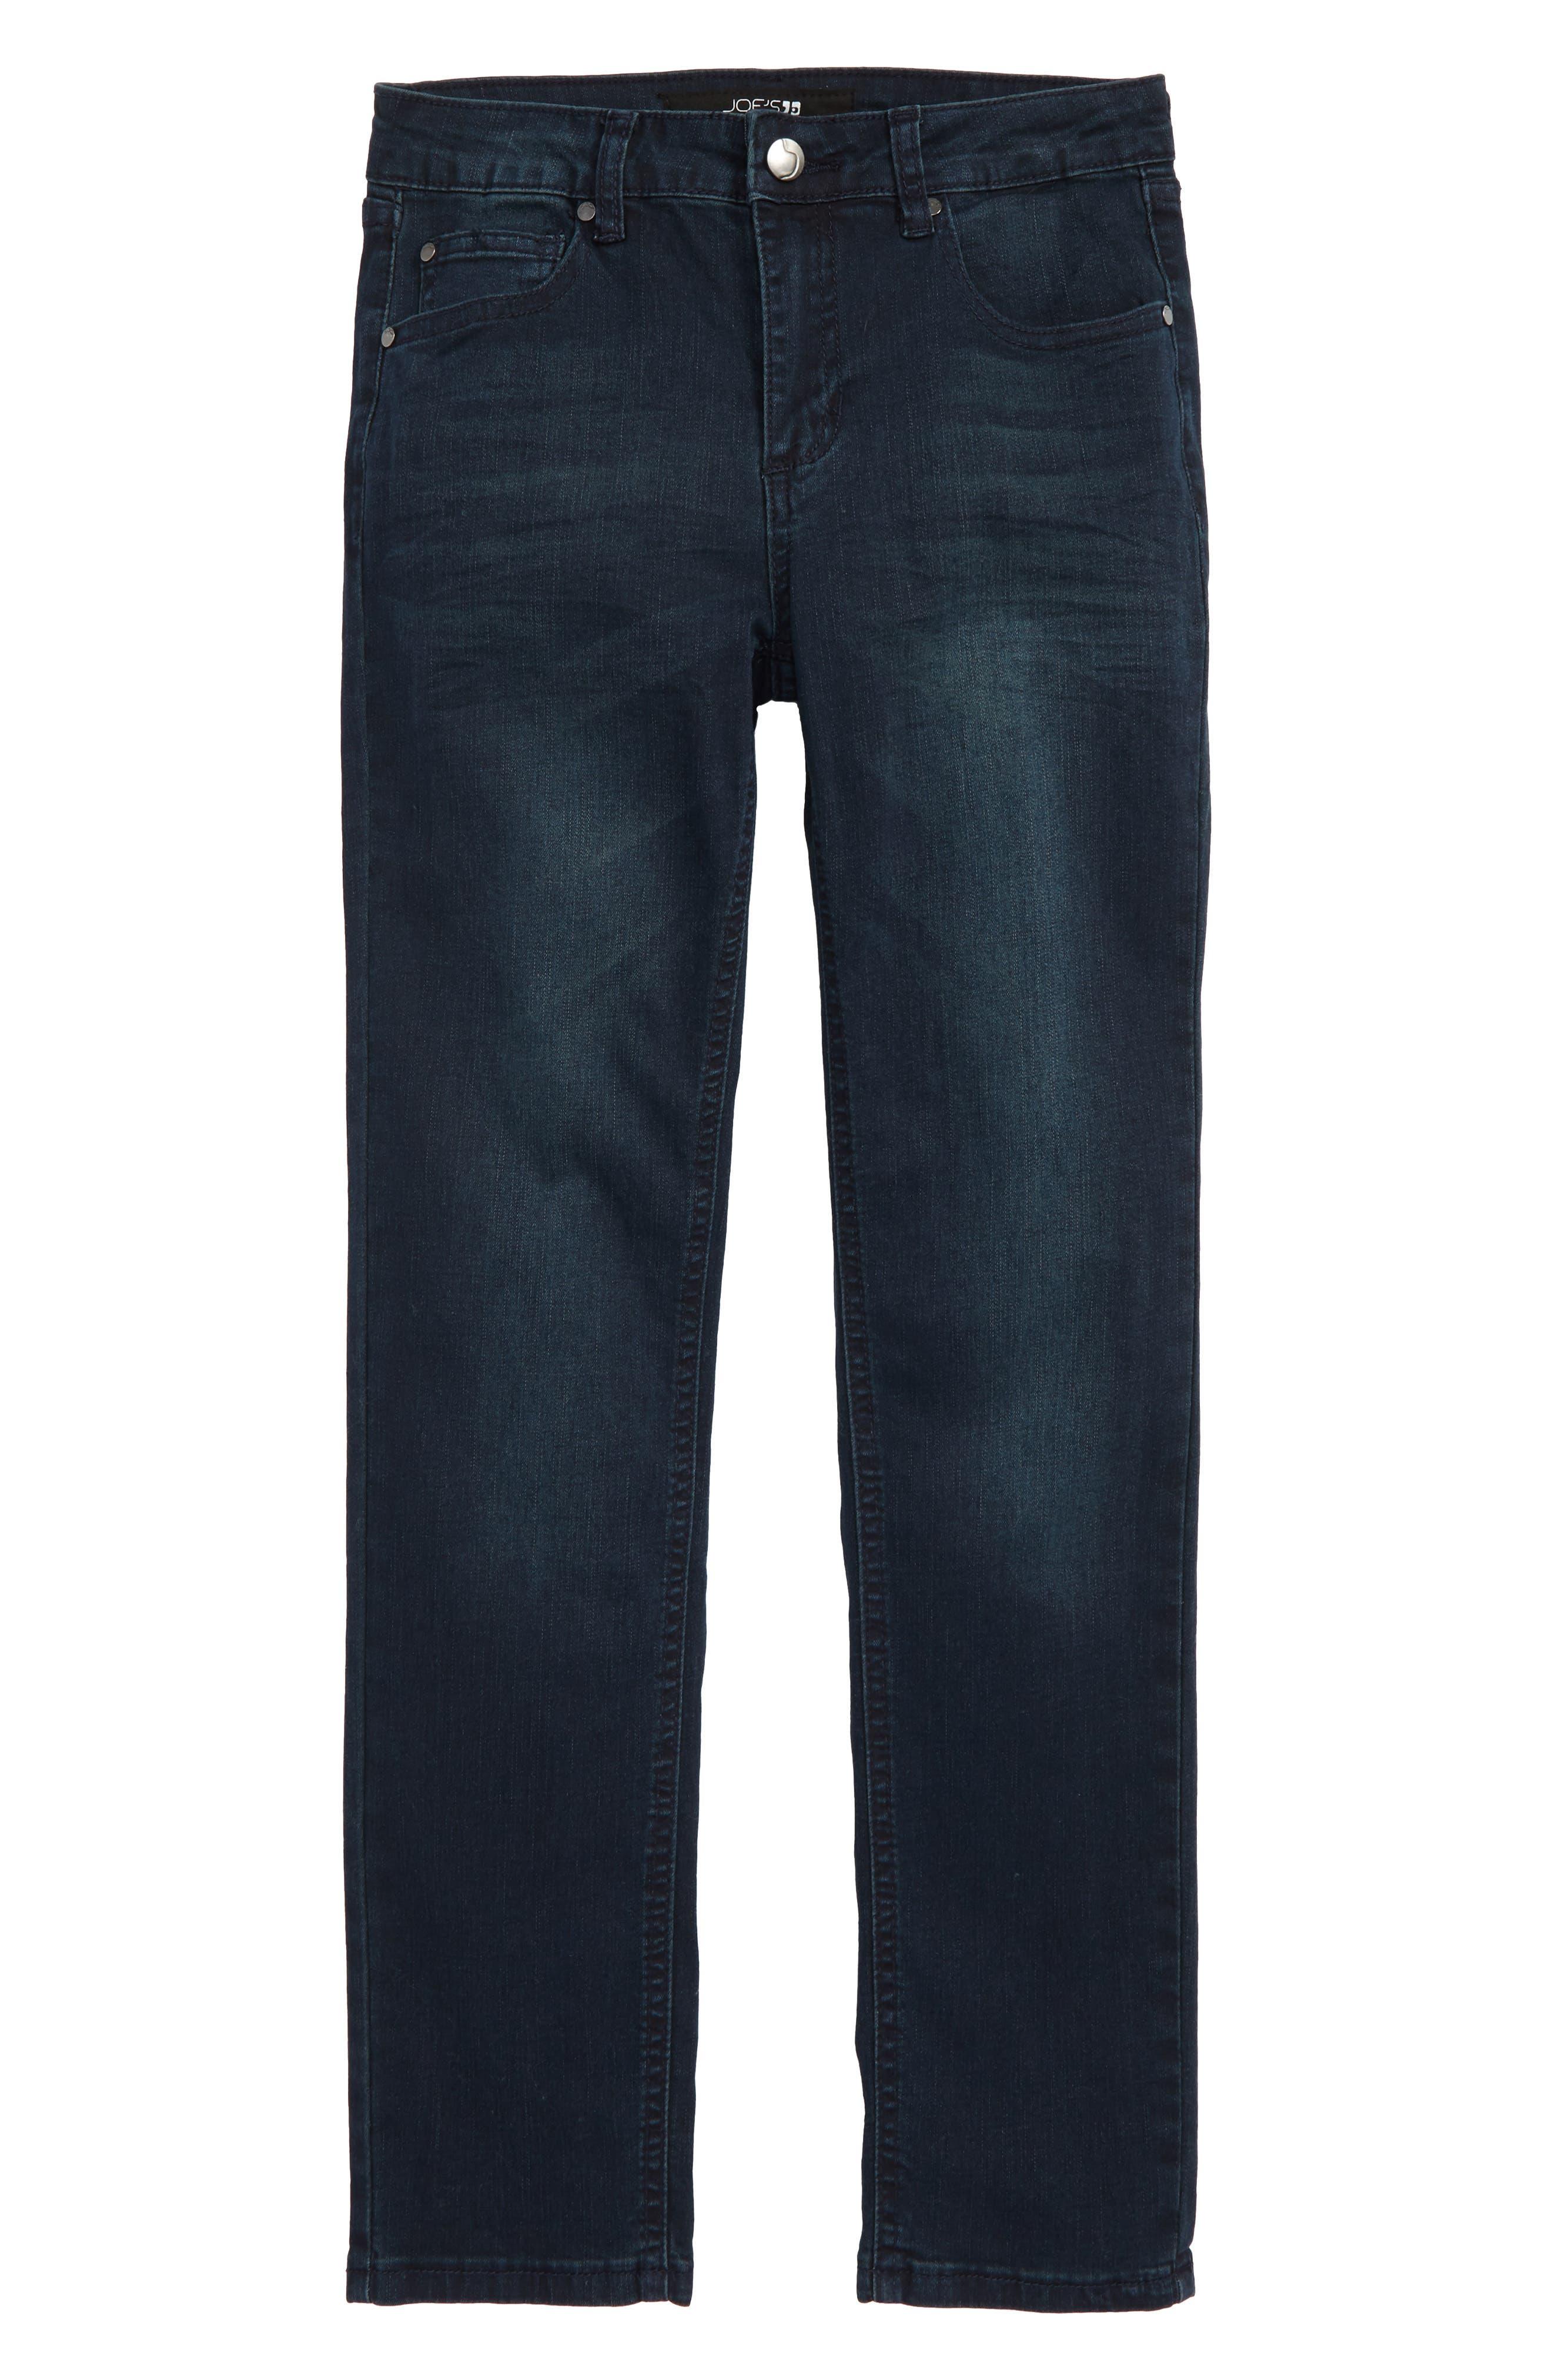 Rad Kinetic Stretch Skinny Jeans, Main, color, 020